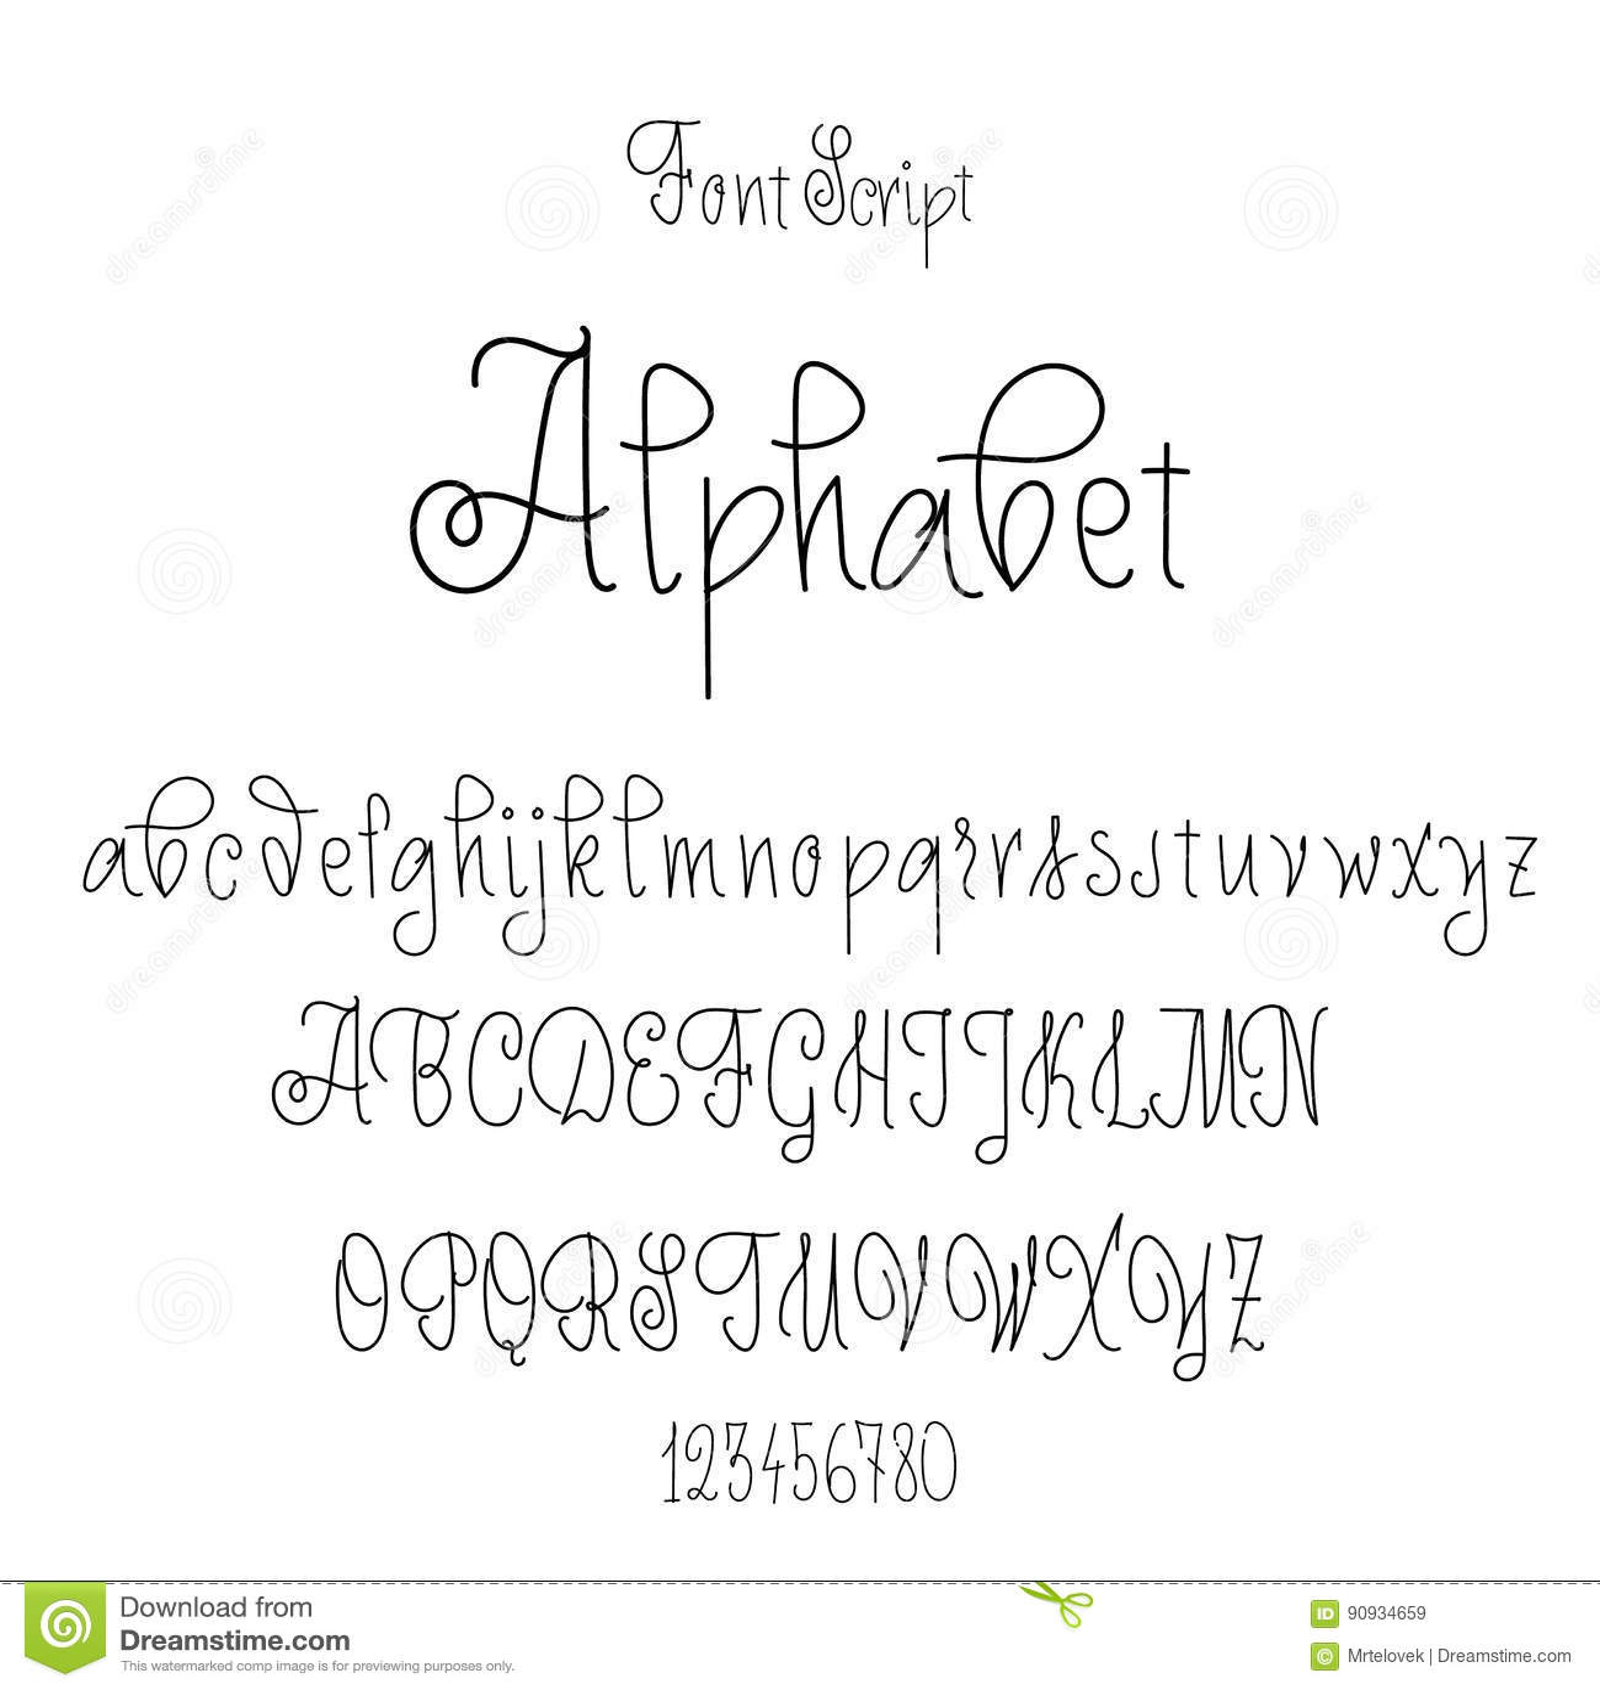 Font Drawn On The Basis Of Handwriting Calligraphy, Modern Cursive